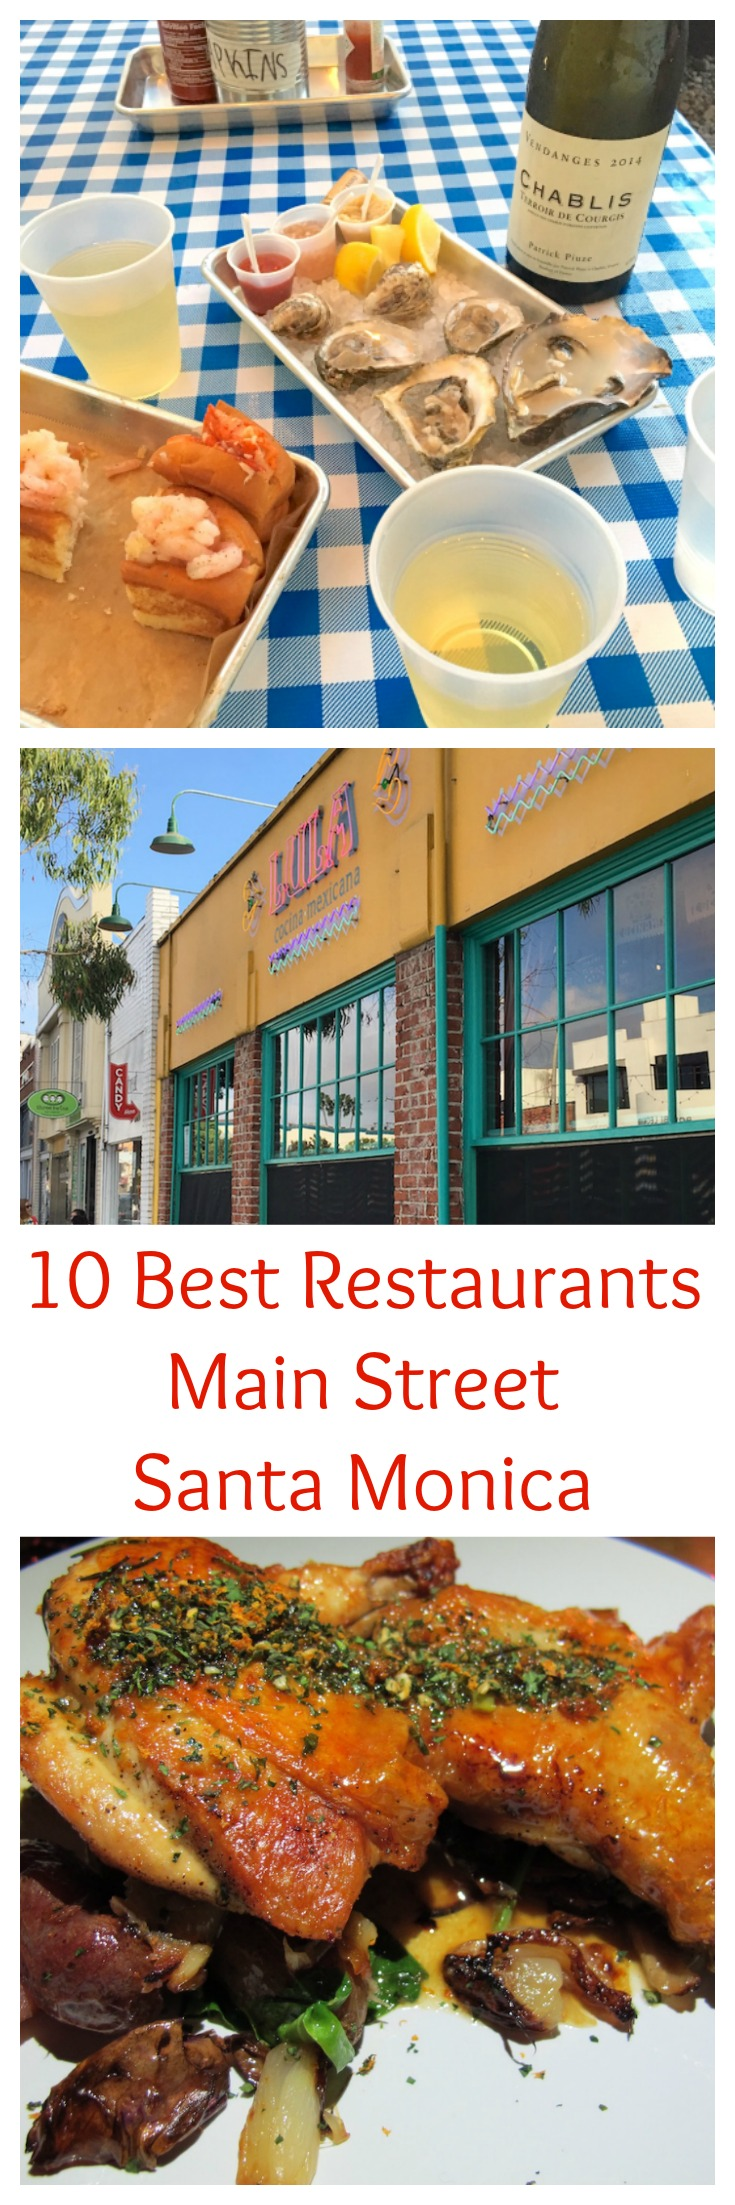 Best Main Street Santa Monica Restaurants | TastingPage.com